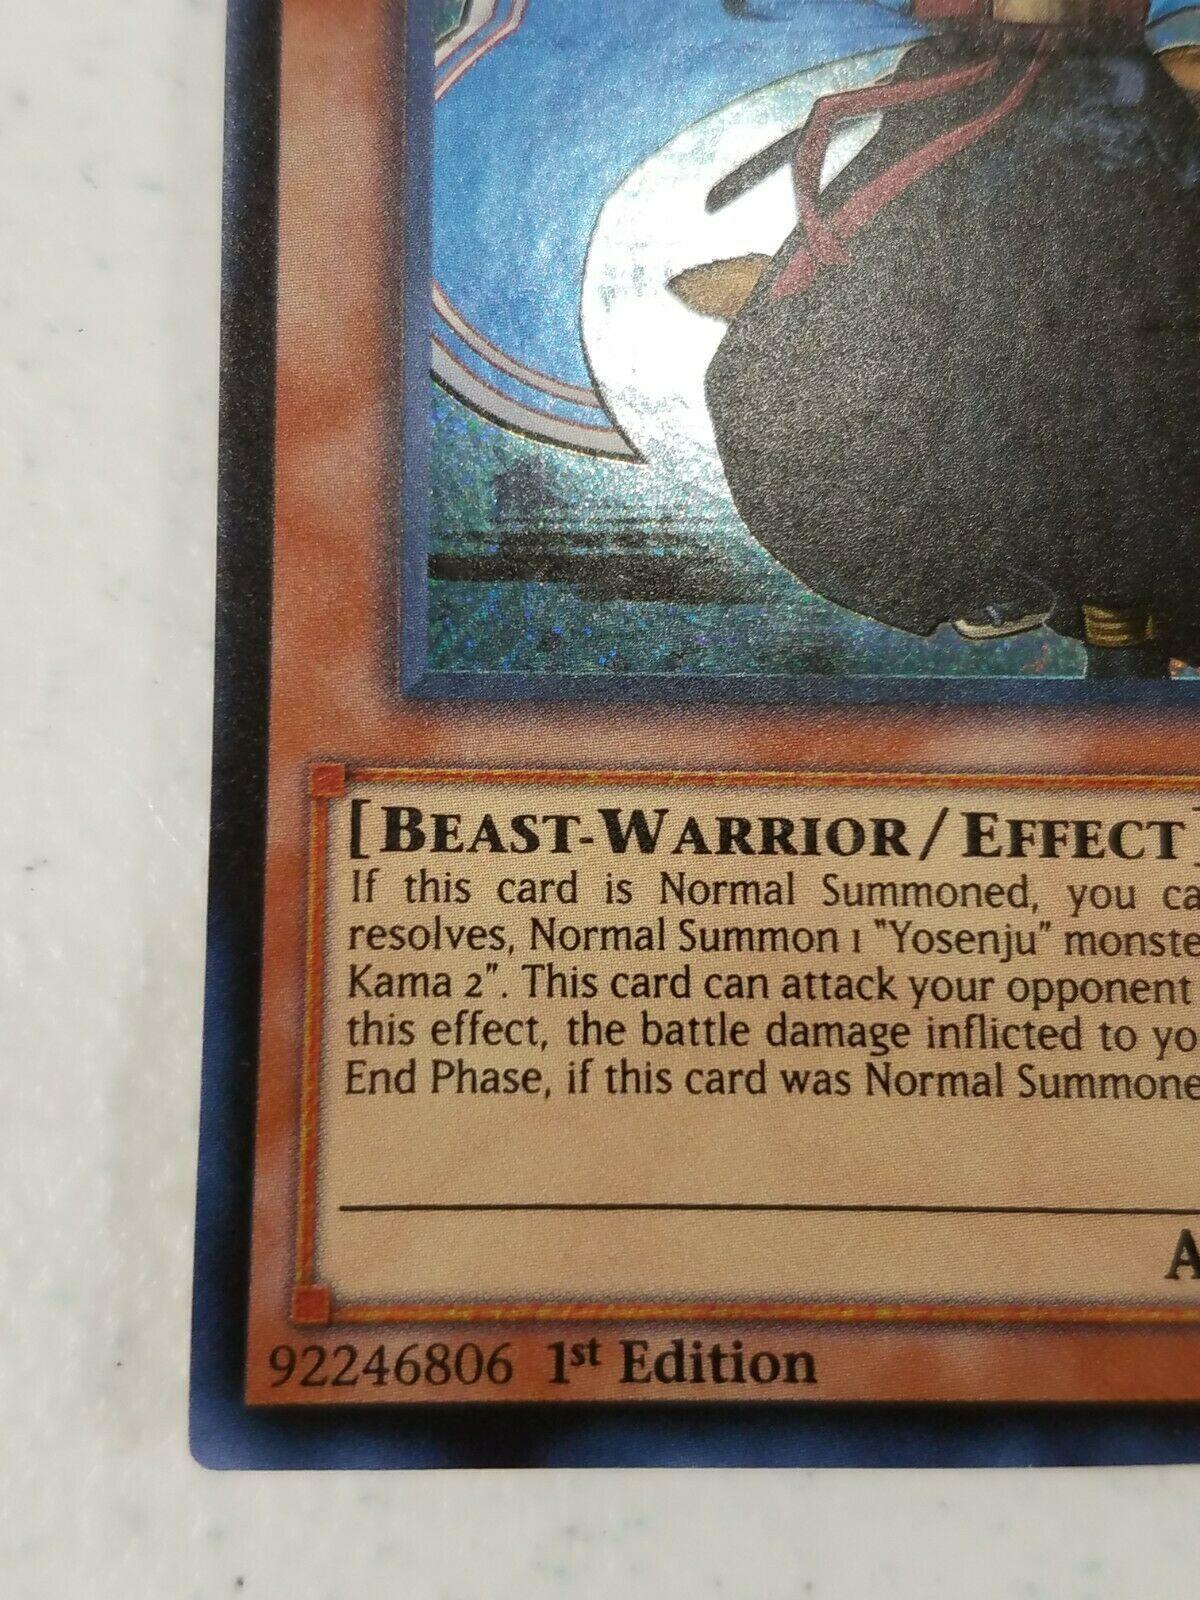 Yu-gi-oh! Trading Card - Yosenju Kama 2 - THSF-EN004 - Secret Rare - 1st Ed.